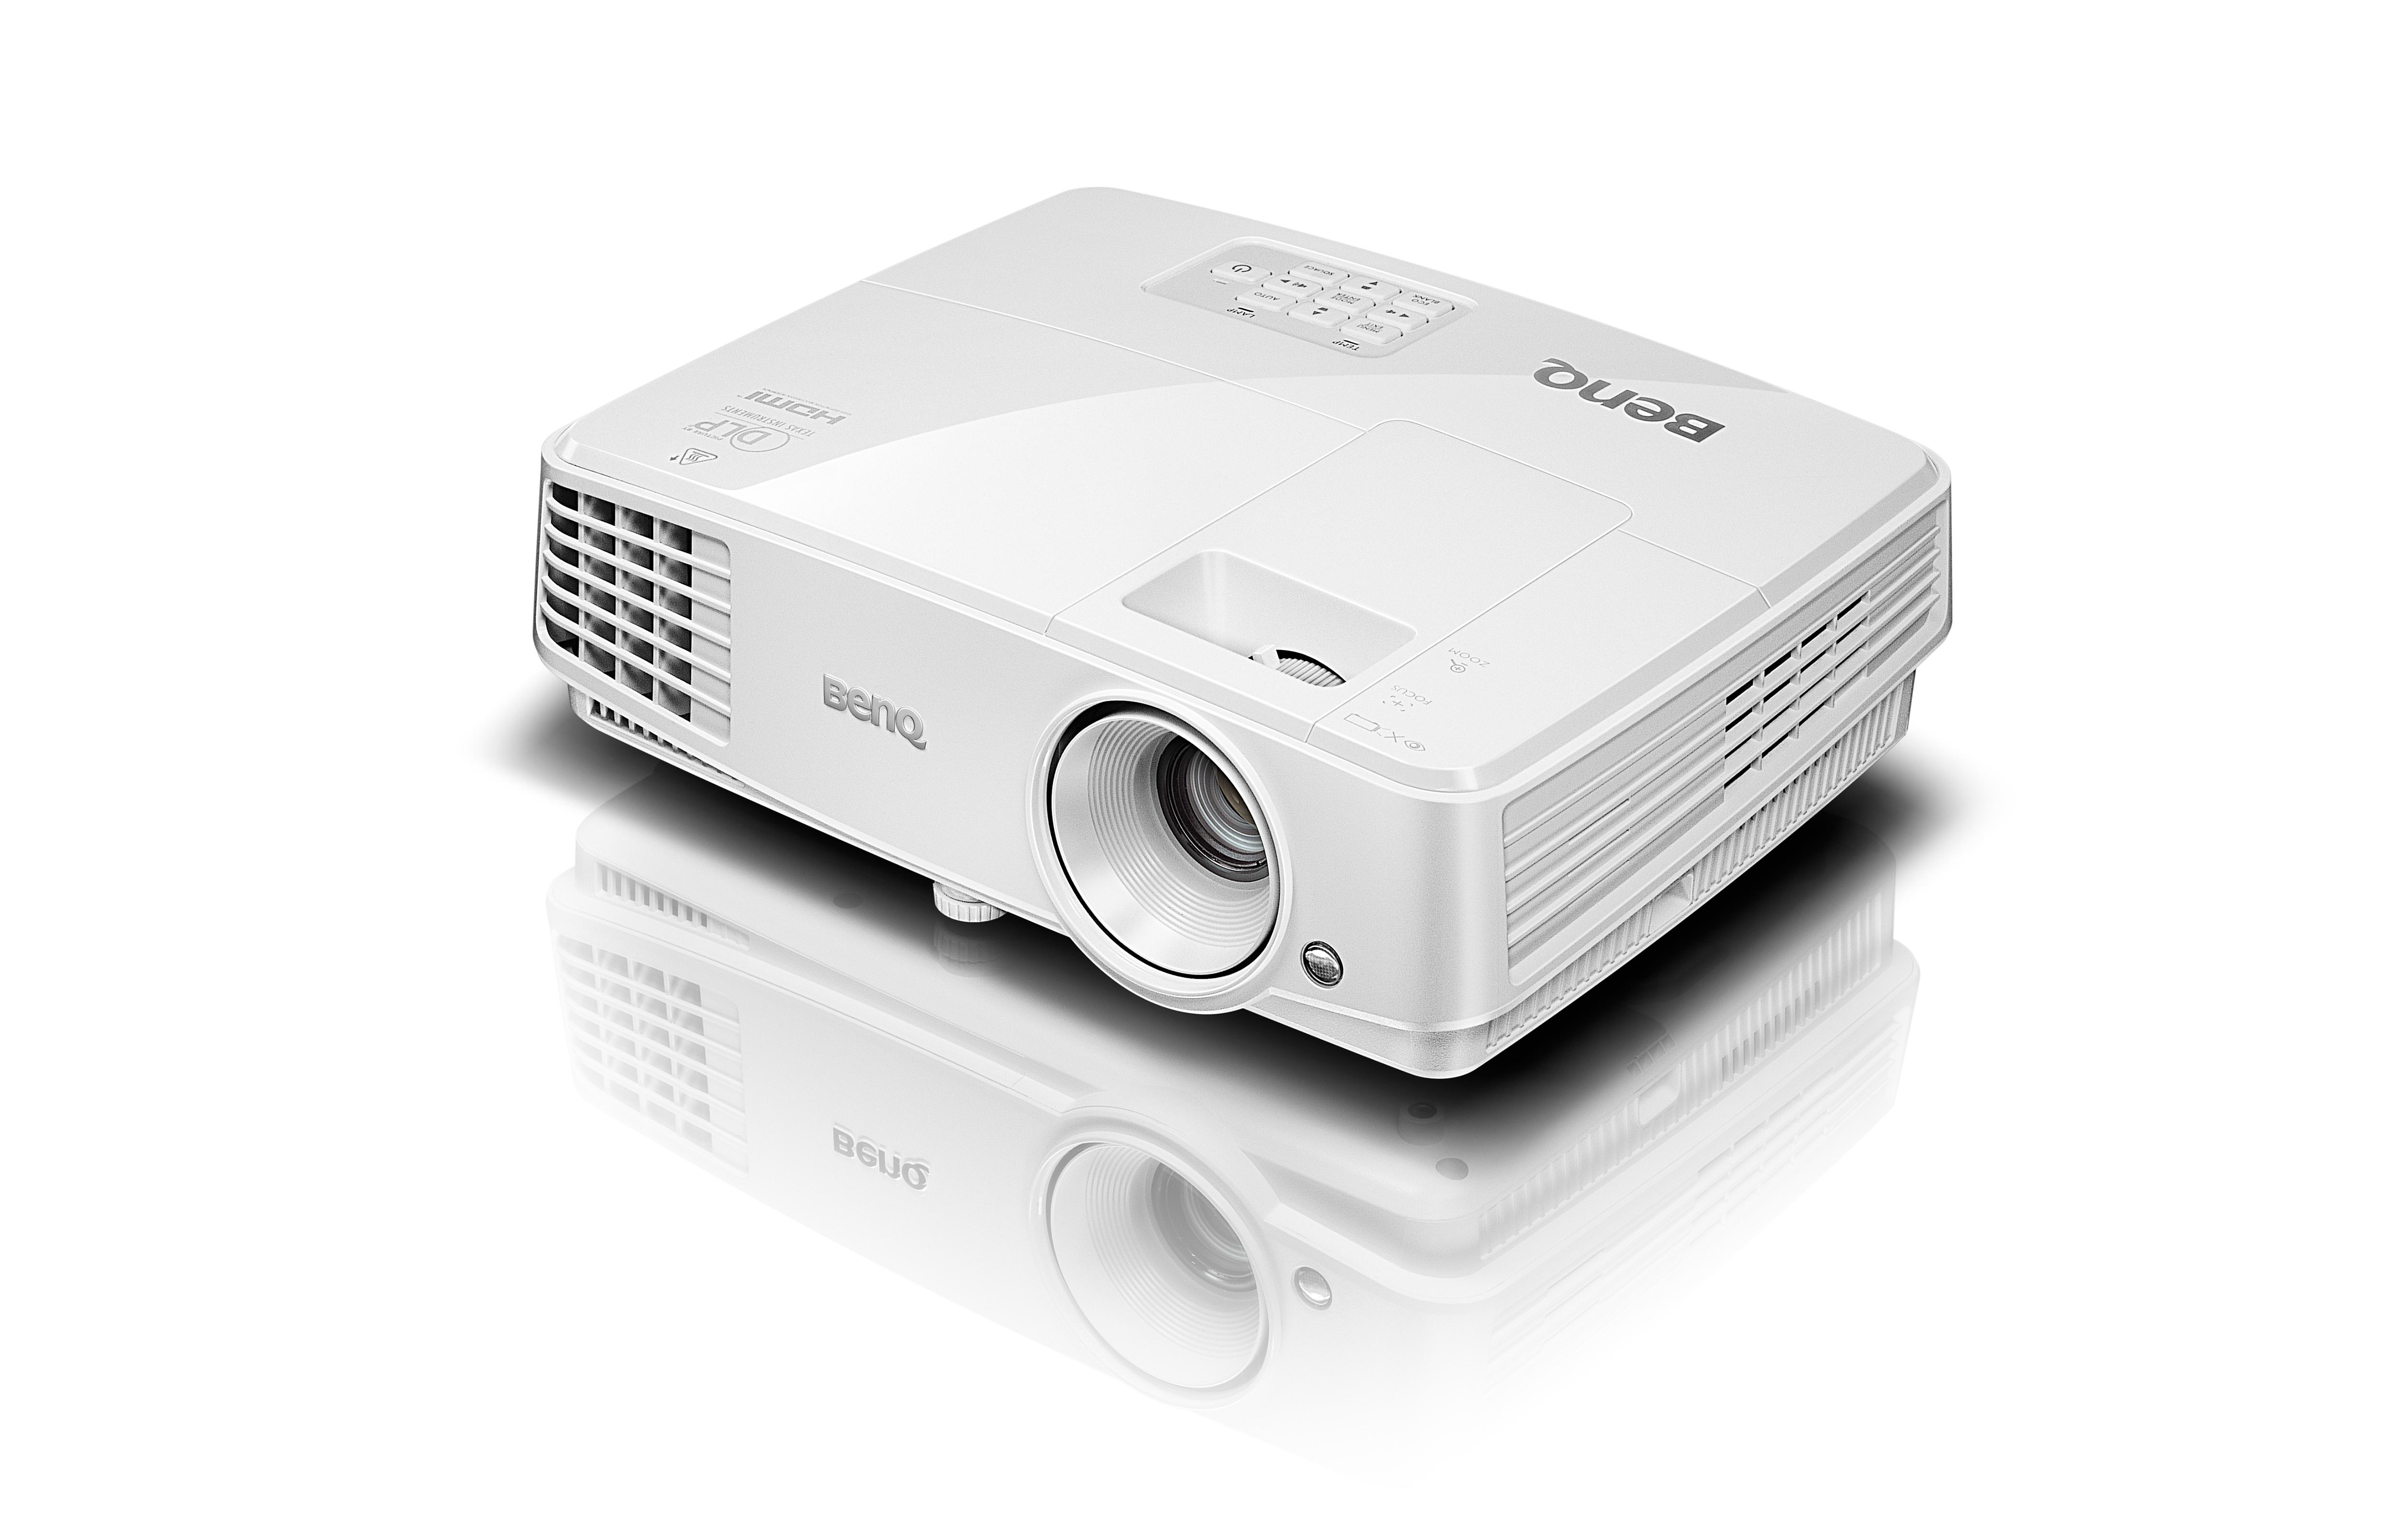 Benq TW529 projector DLP WXGA 1280x800 13000: 3300ANSI lumens DLP WXGA (1280x800) 3D Portable